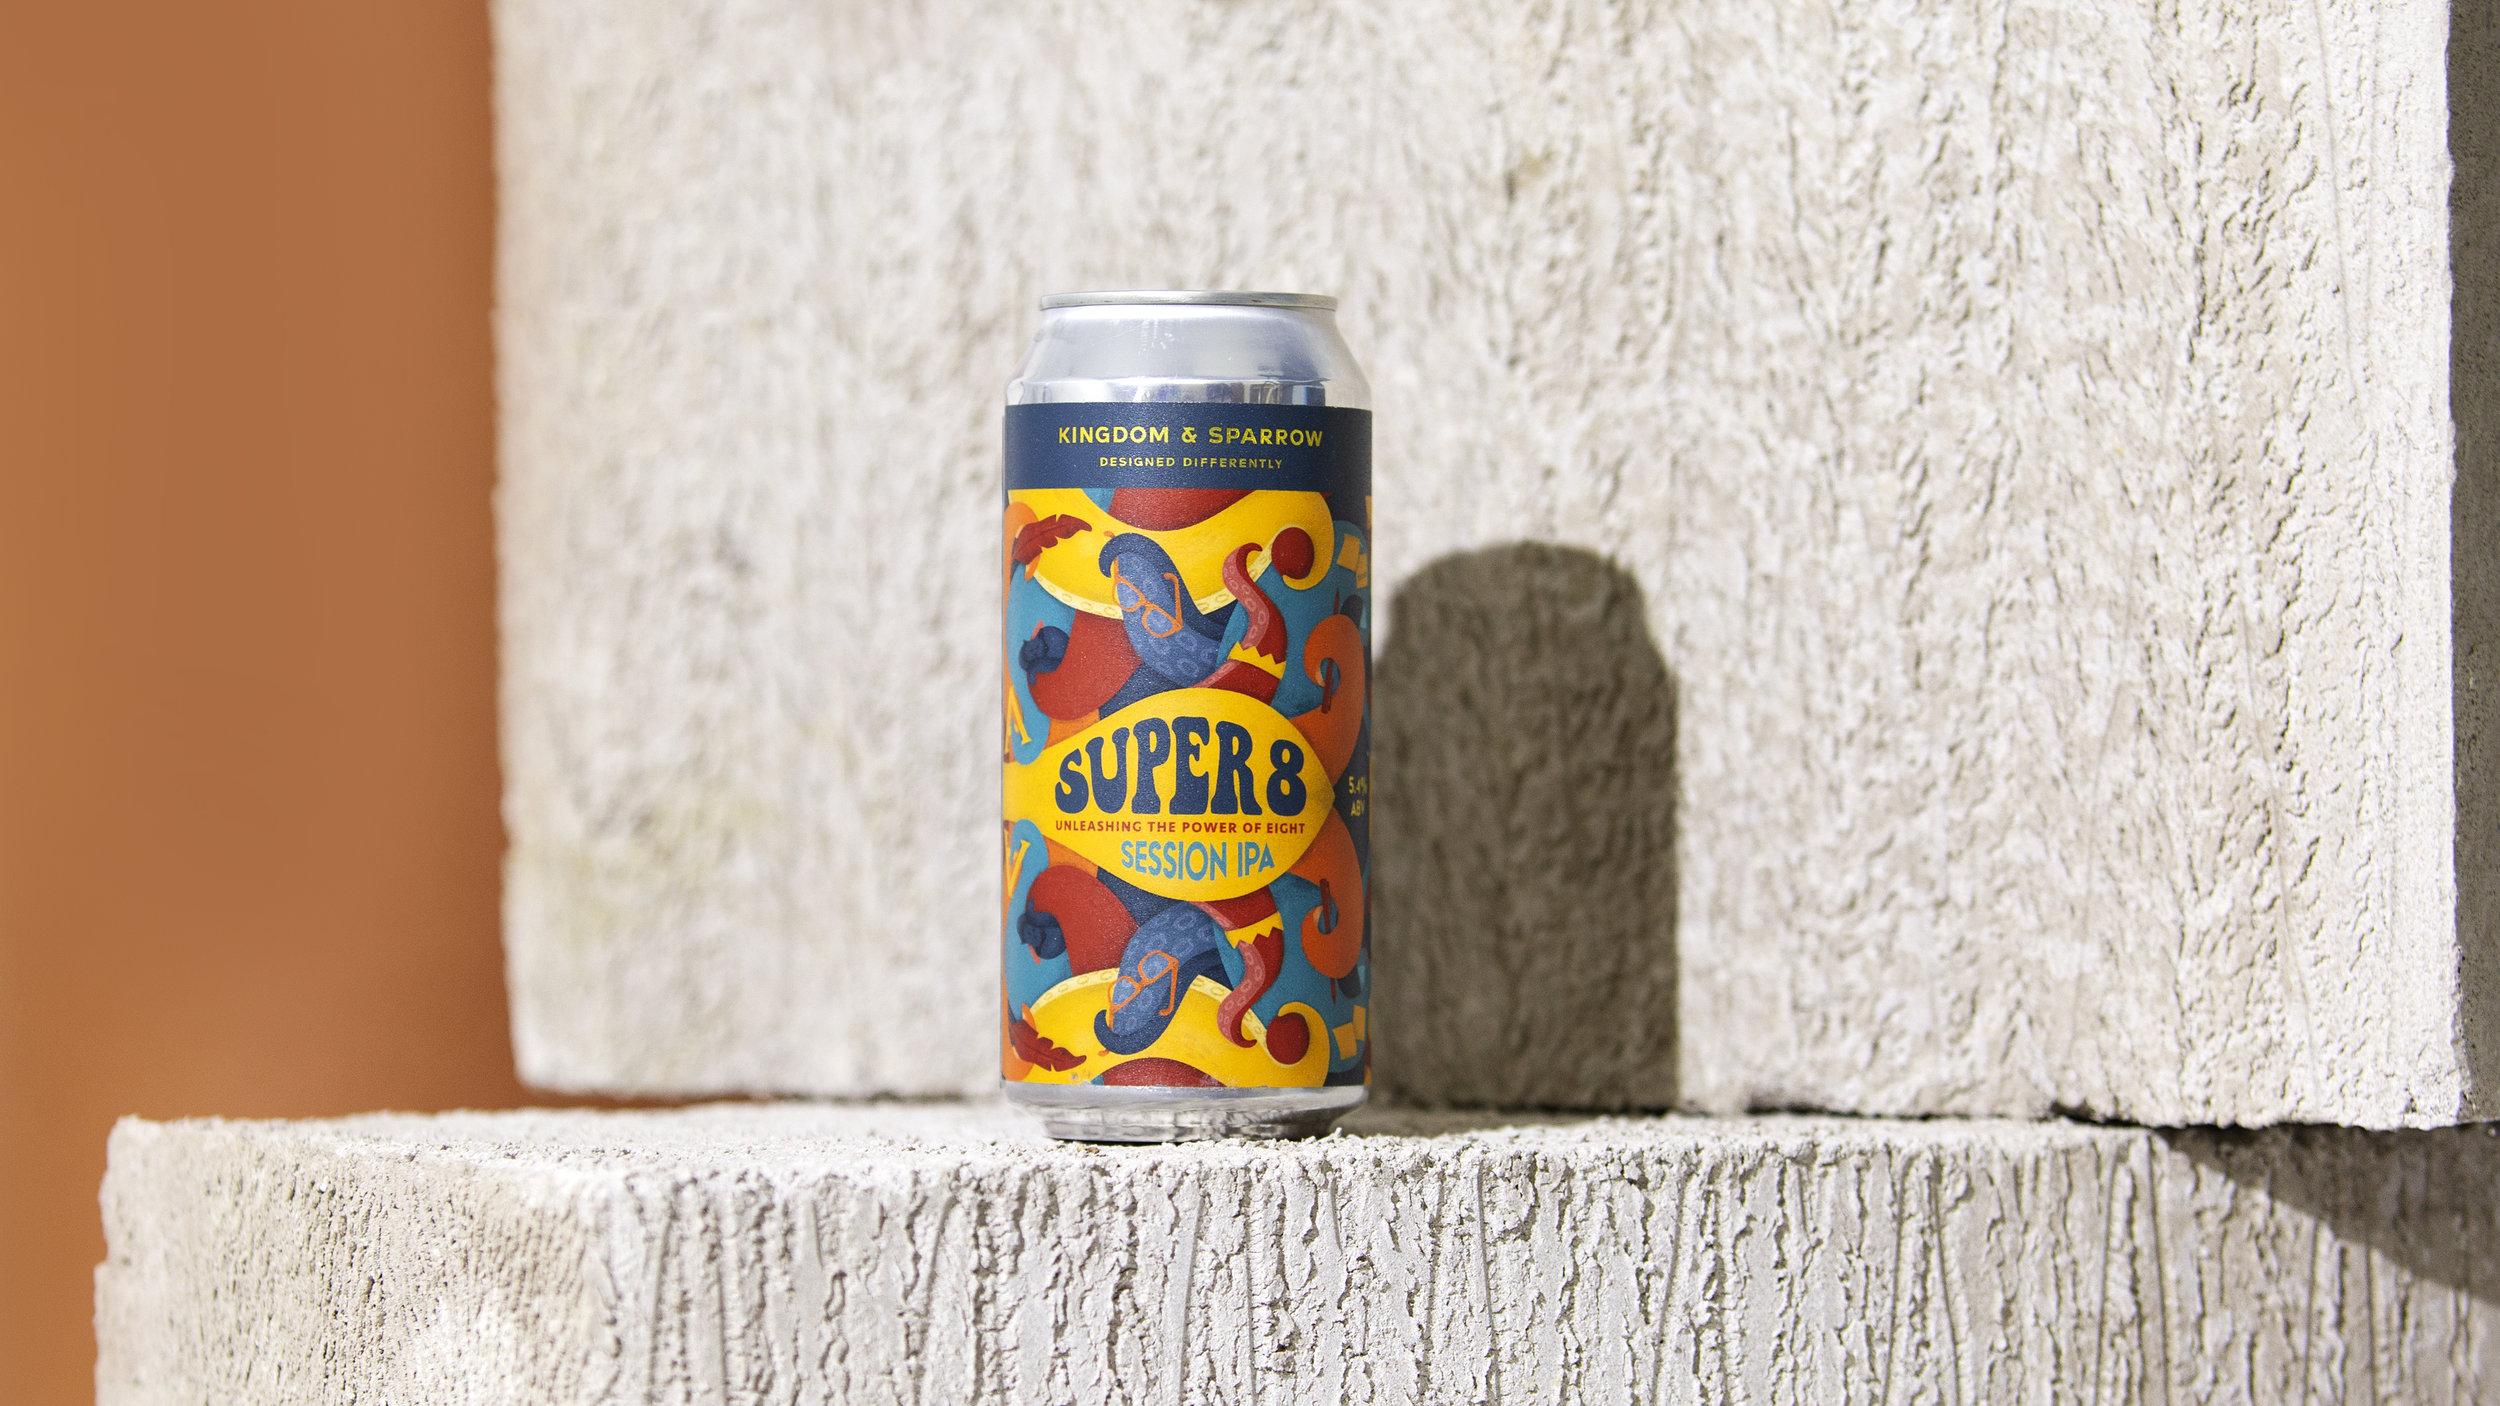 Super 8 Kingdom & Sparrow Studio Beer